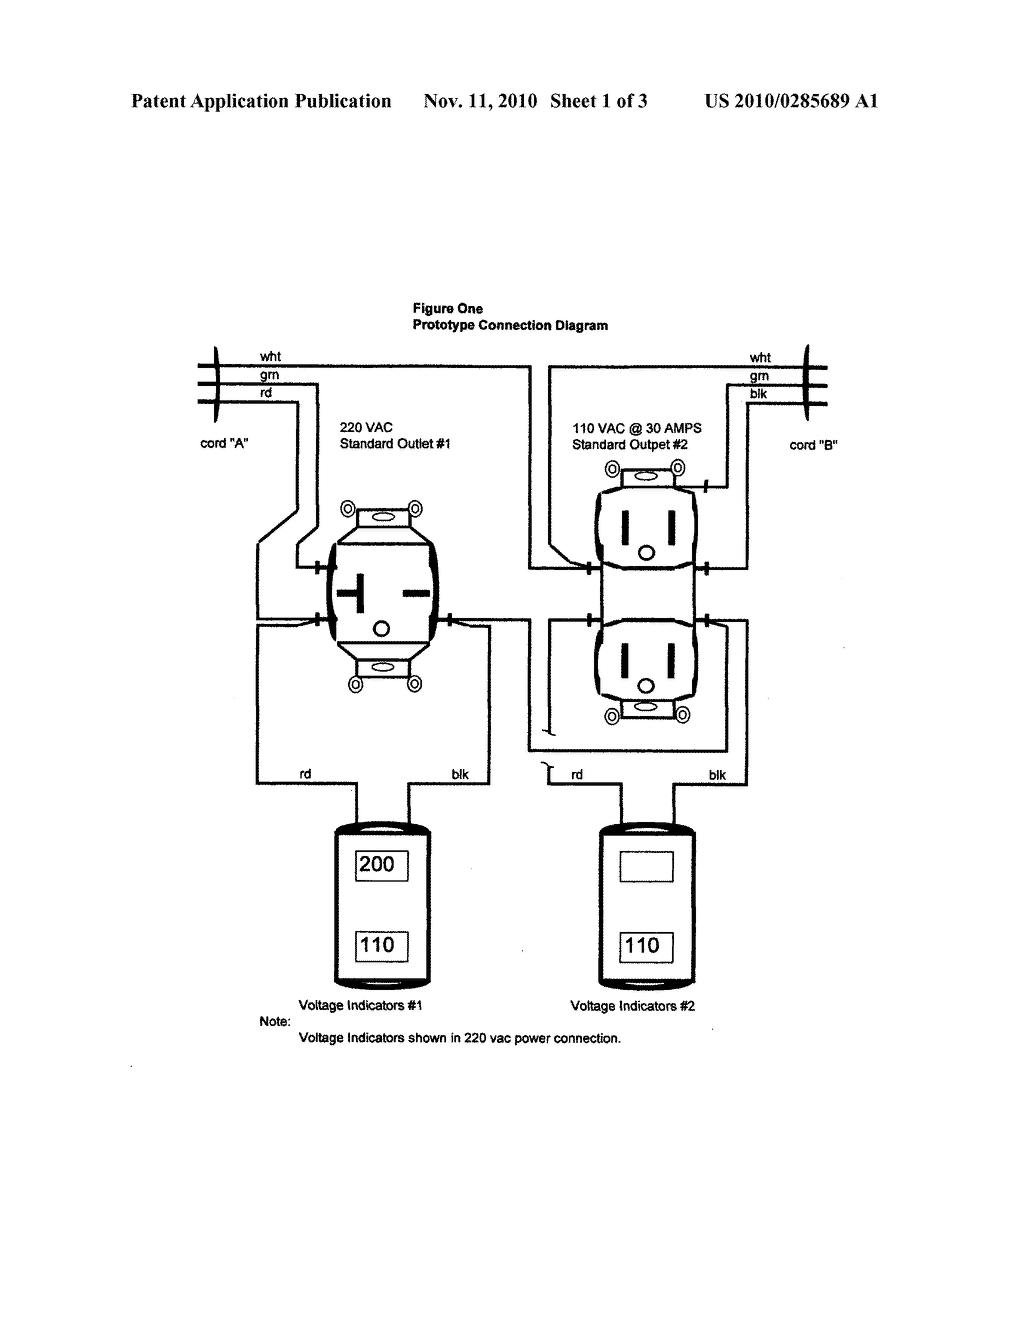 Wiring Diagram Receptacles Shop For Best Secret A Split Switched Receptacle L6 20r 3 Wire 220 Volt Double